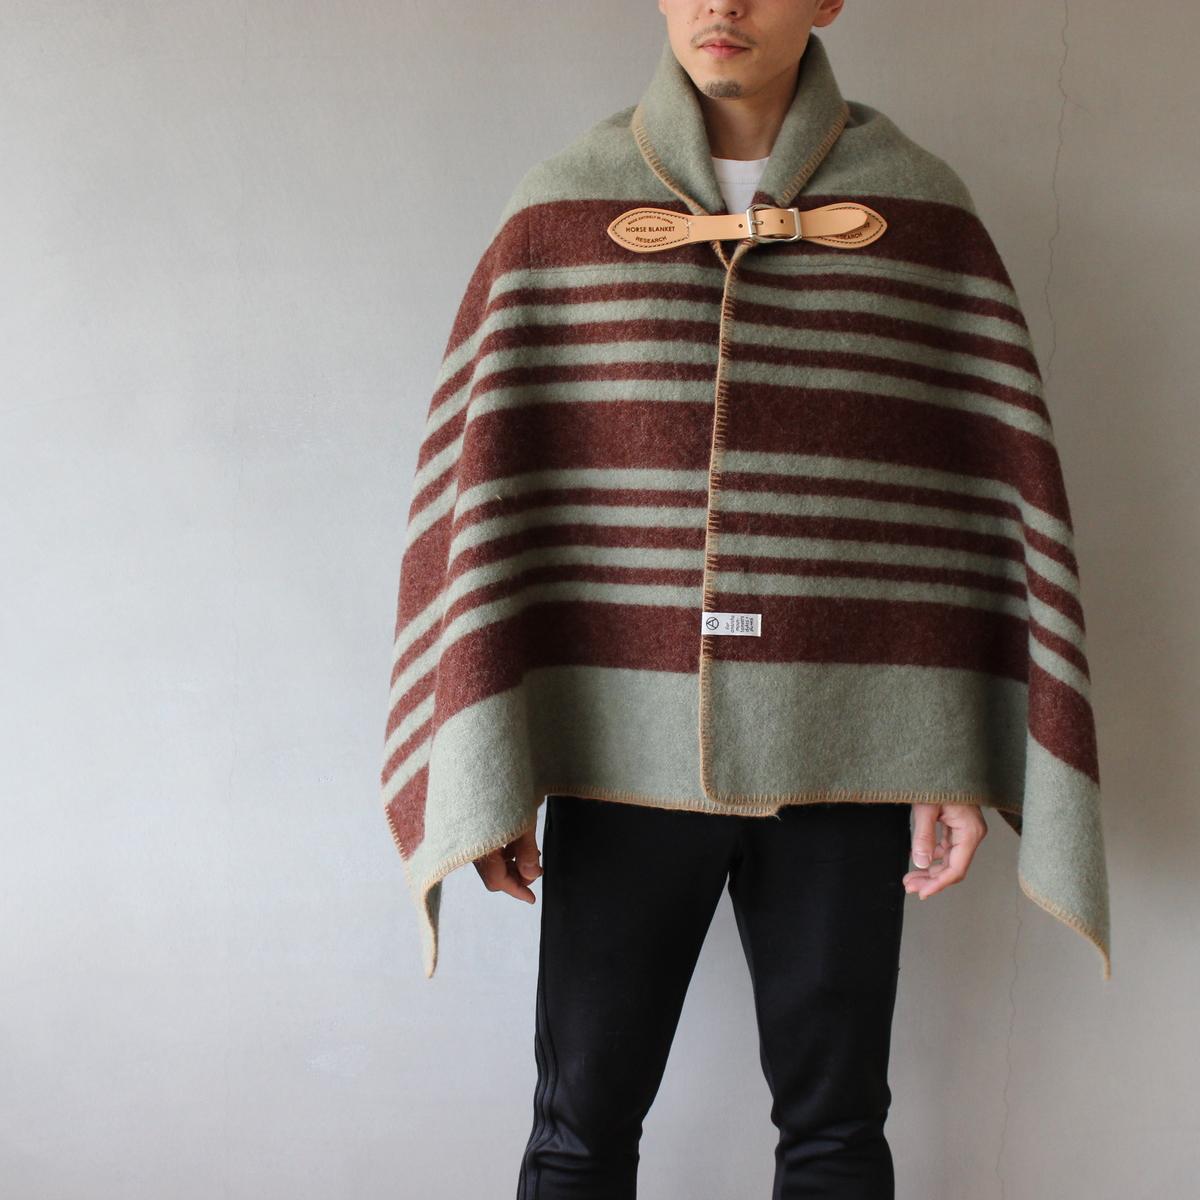 Horse Blanket 1/2 gray×wine【送料無料】【Horse Blanket Research】